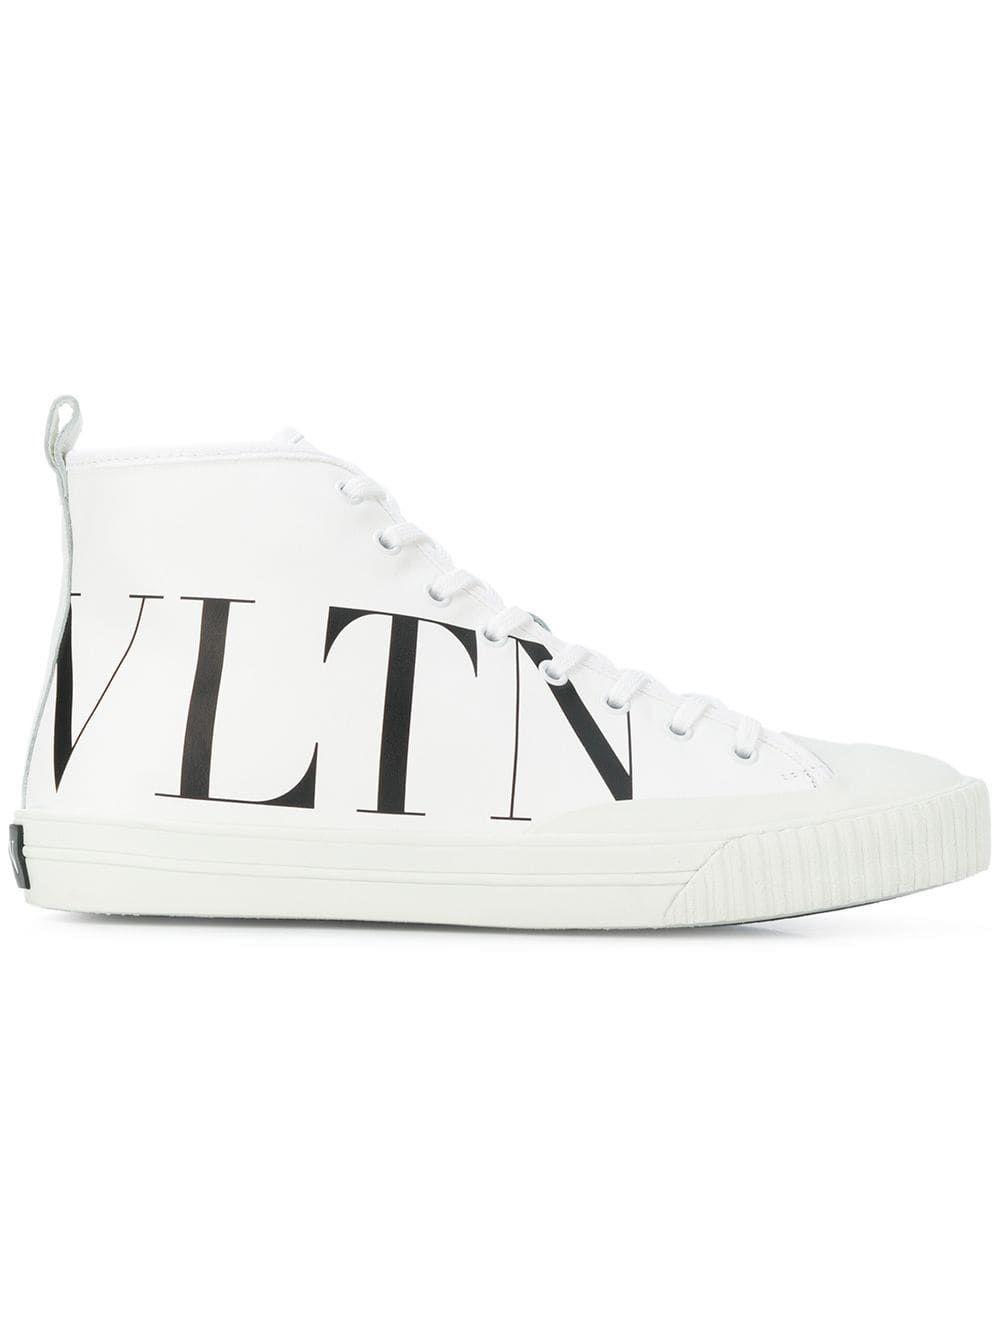 2947ce7a807 Valentino Valentino Garavani VLTN hi-top sneakers - White in 2019 ...